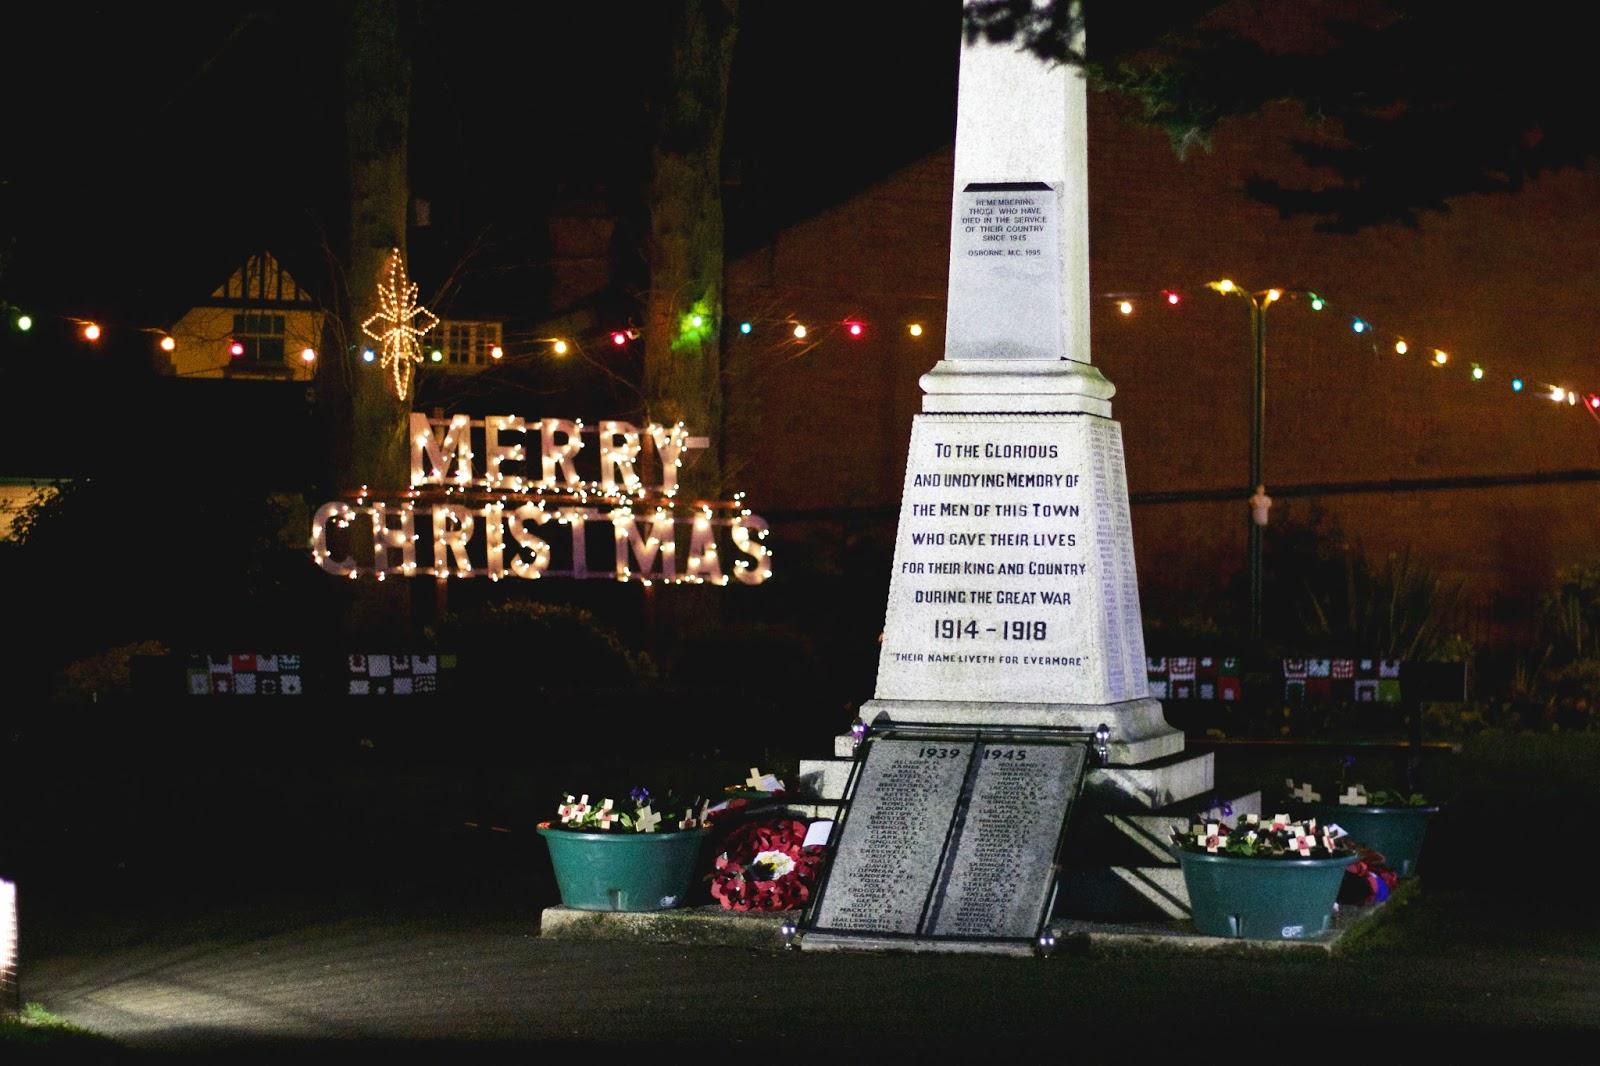 Belper Christmas Decorations, Lights, Memorial Gardens